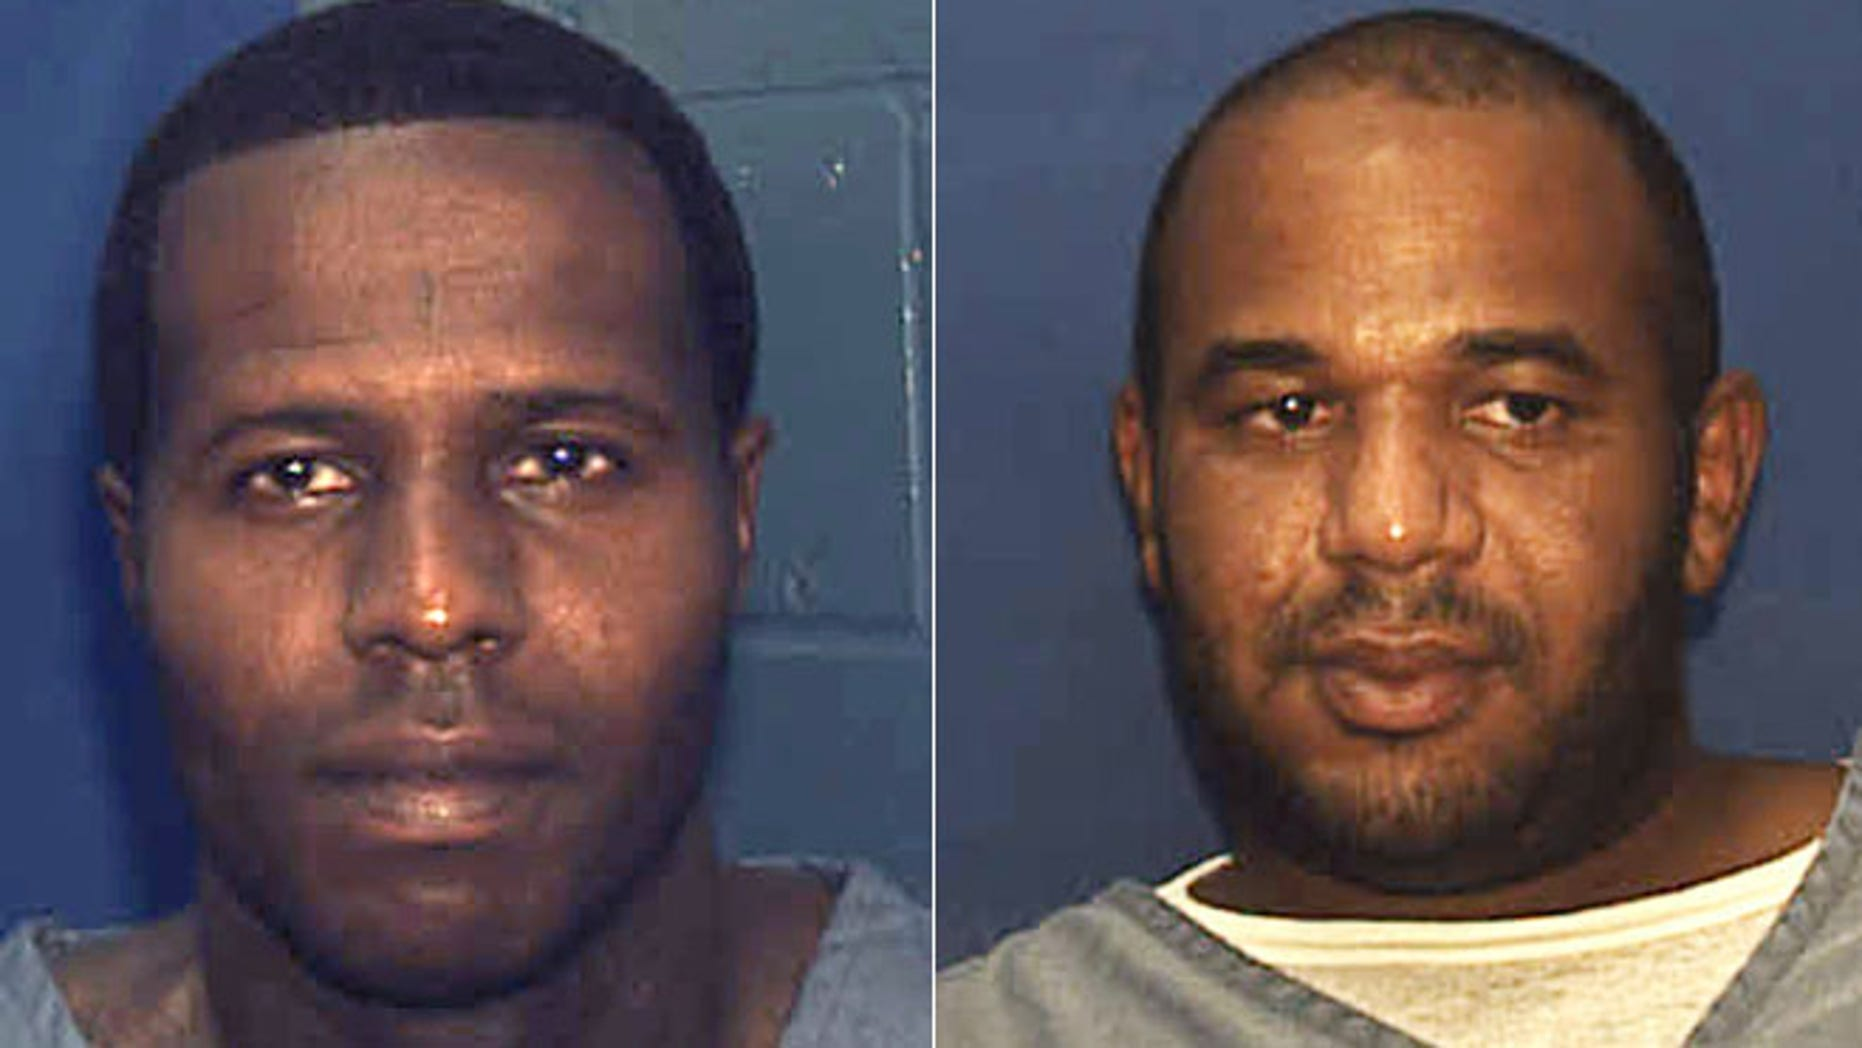 This split shows Charles Walker (left) and Joseph Jenkins (right).